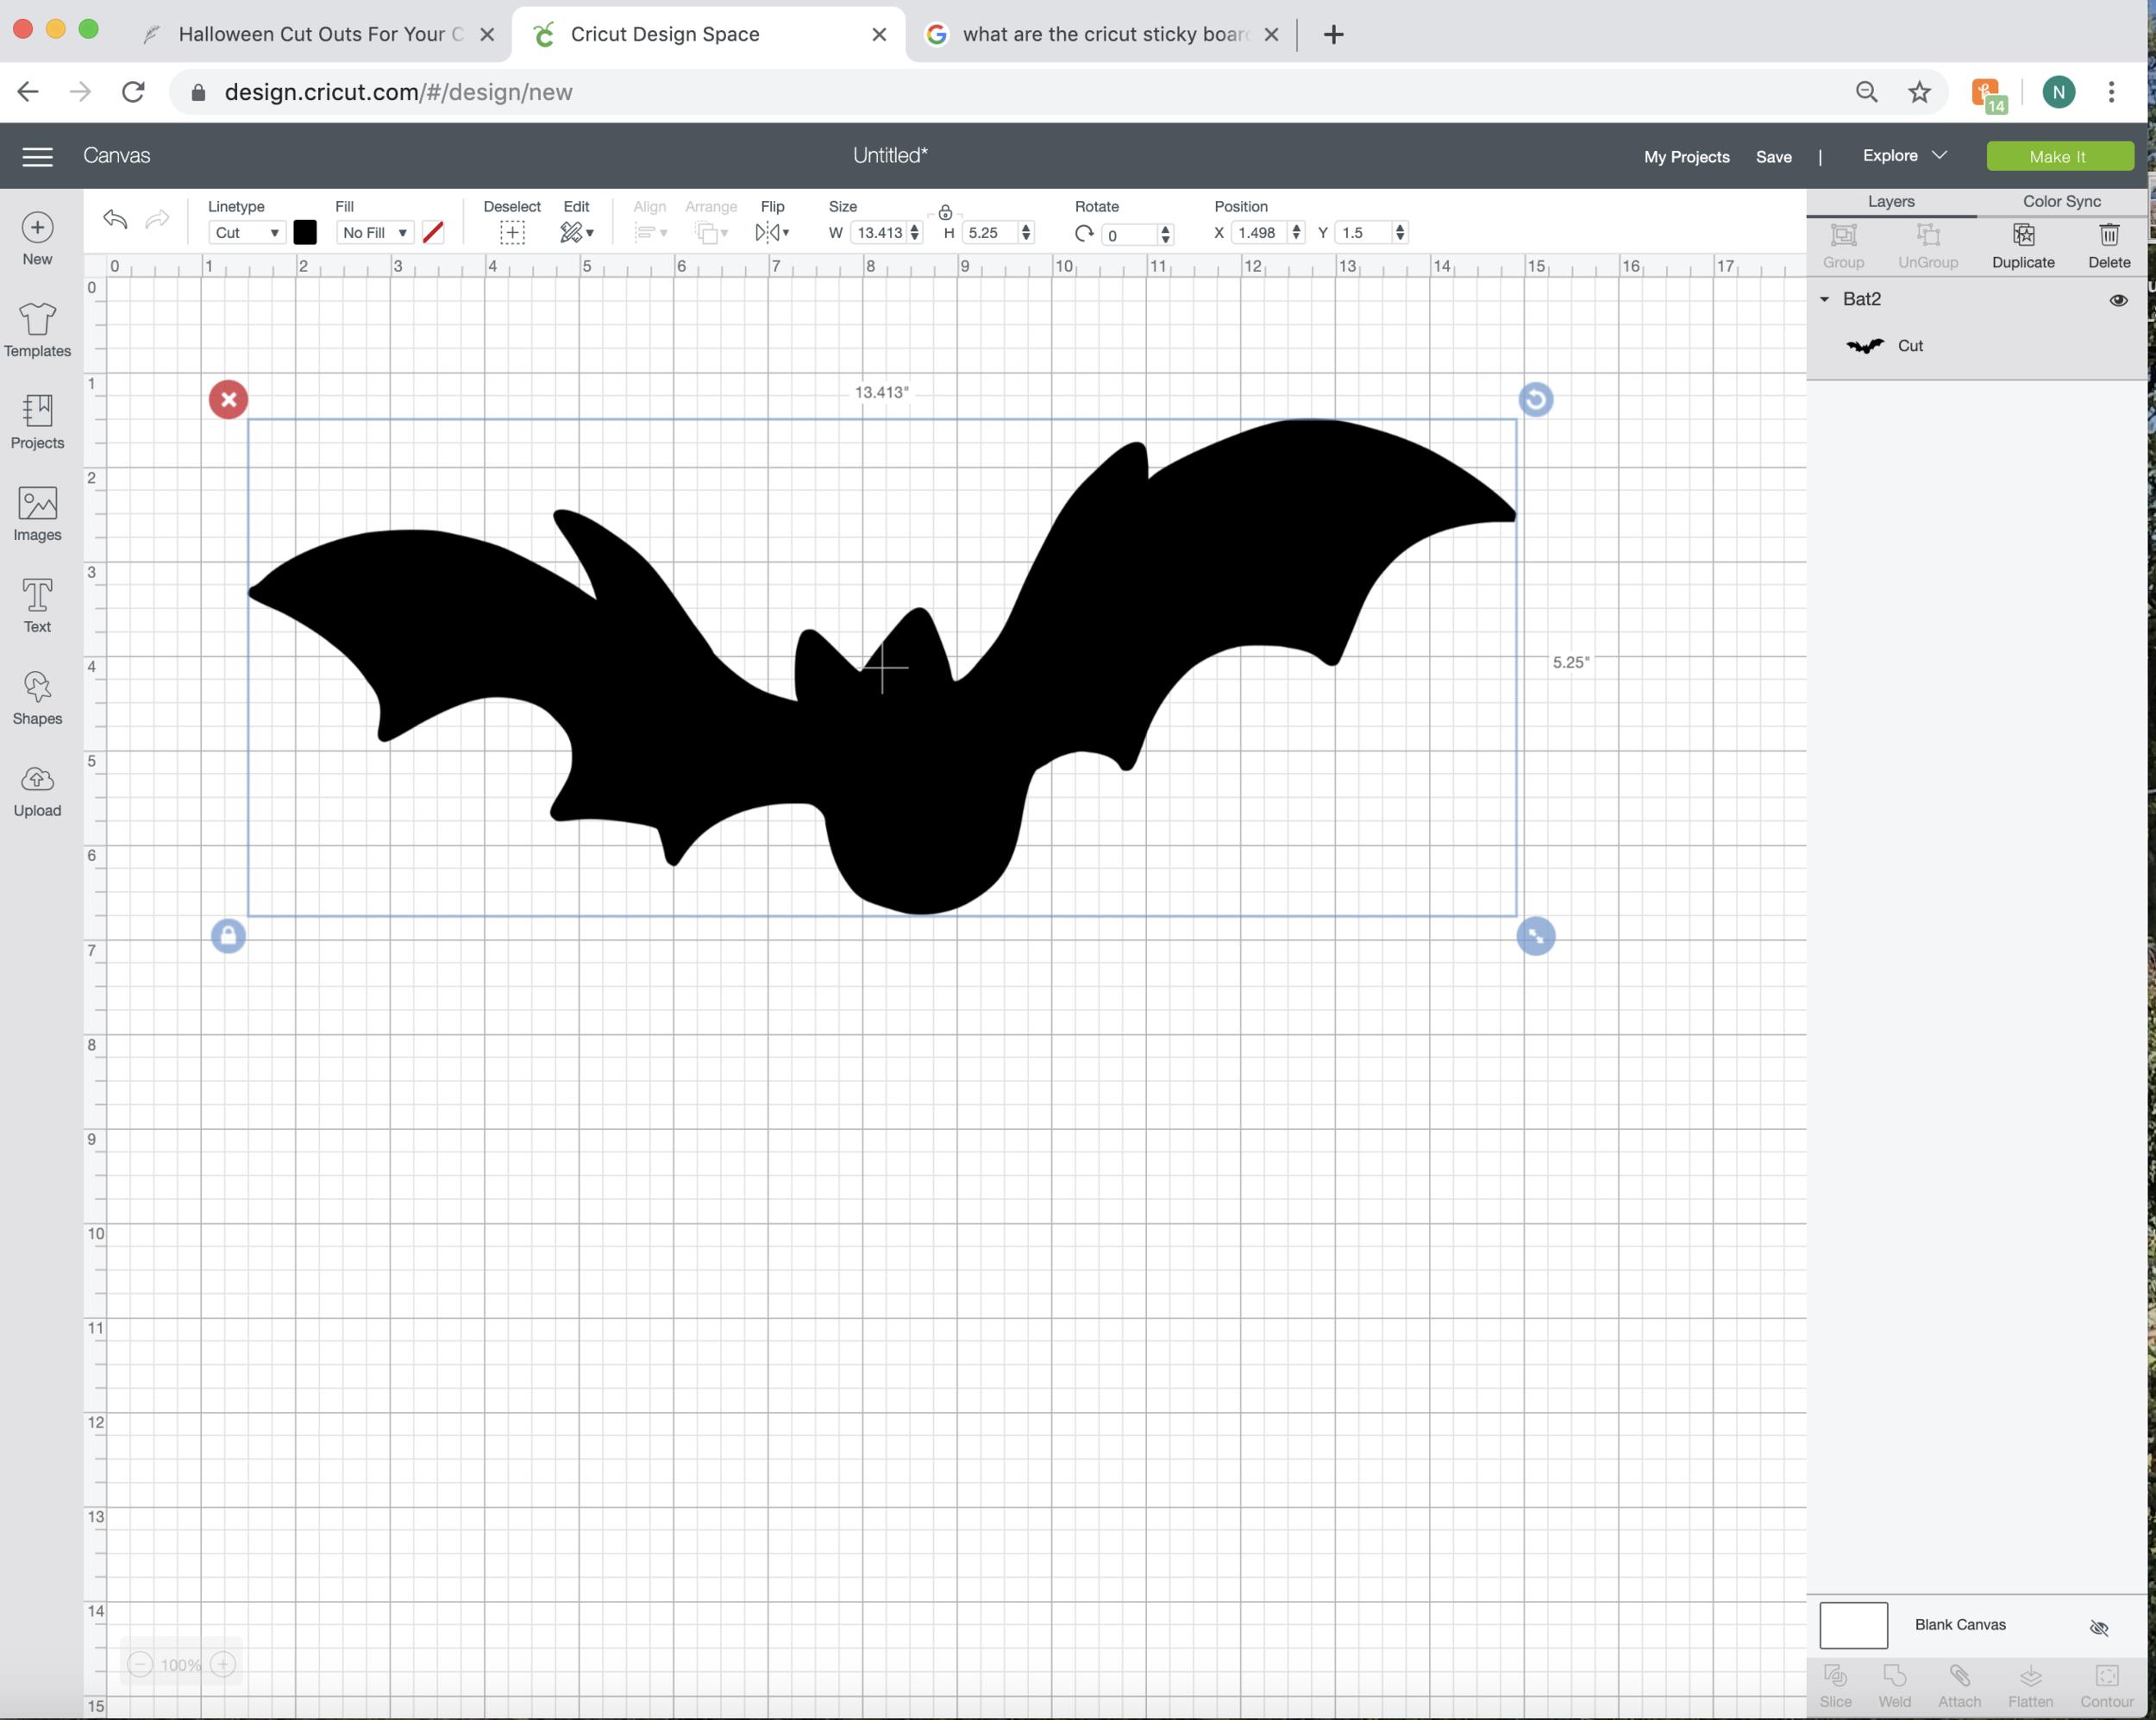 Cricut Tutorial with bats for halloween